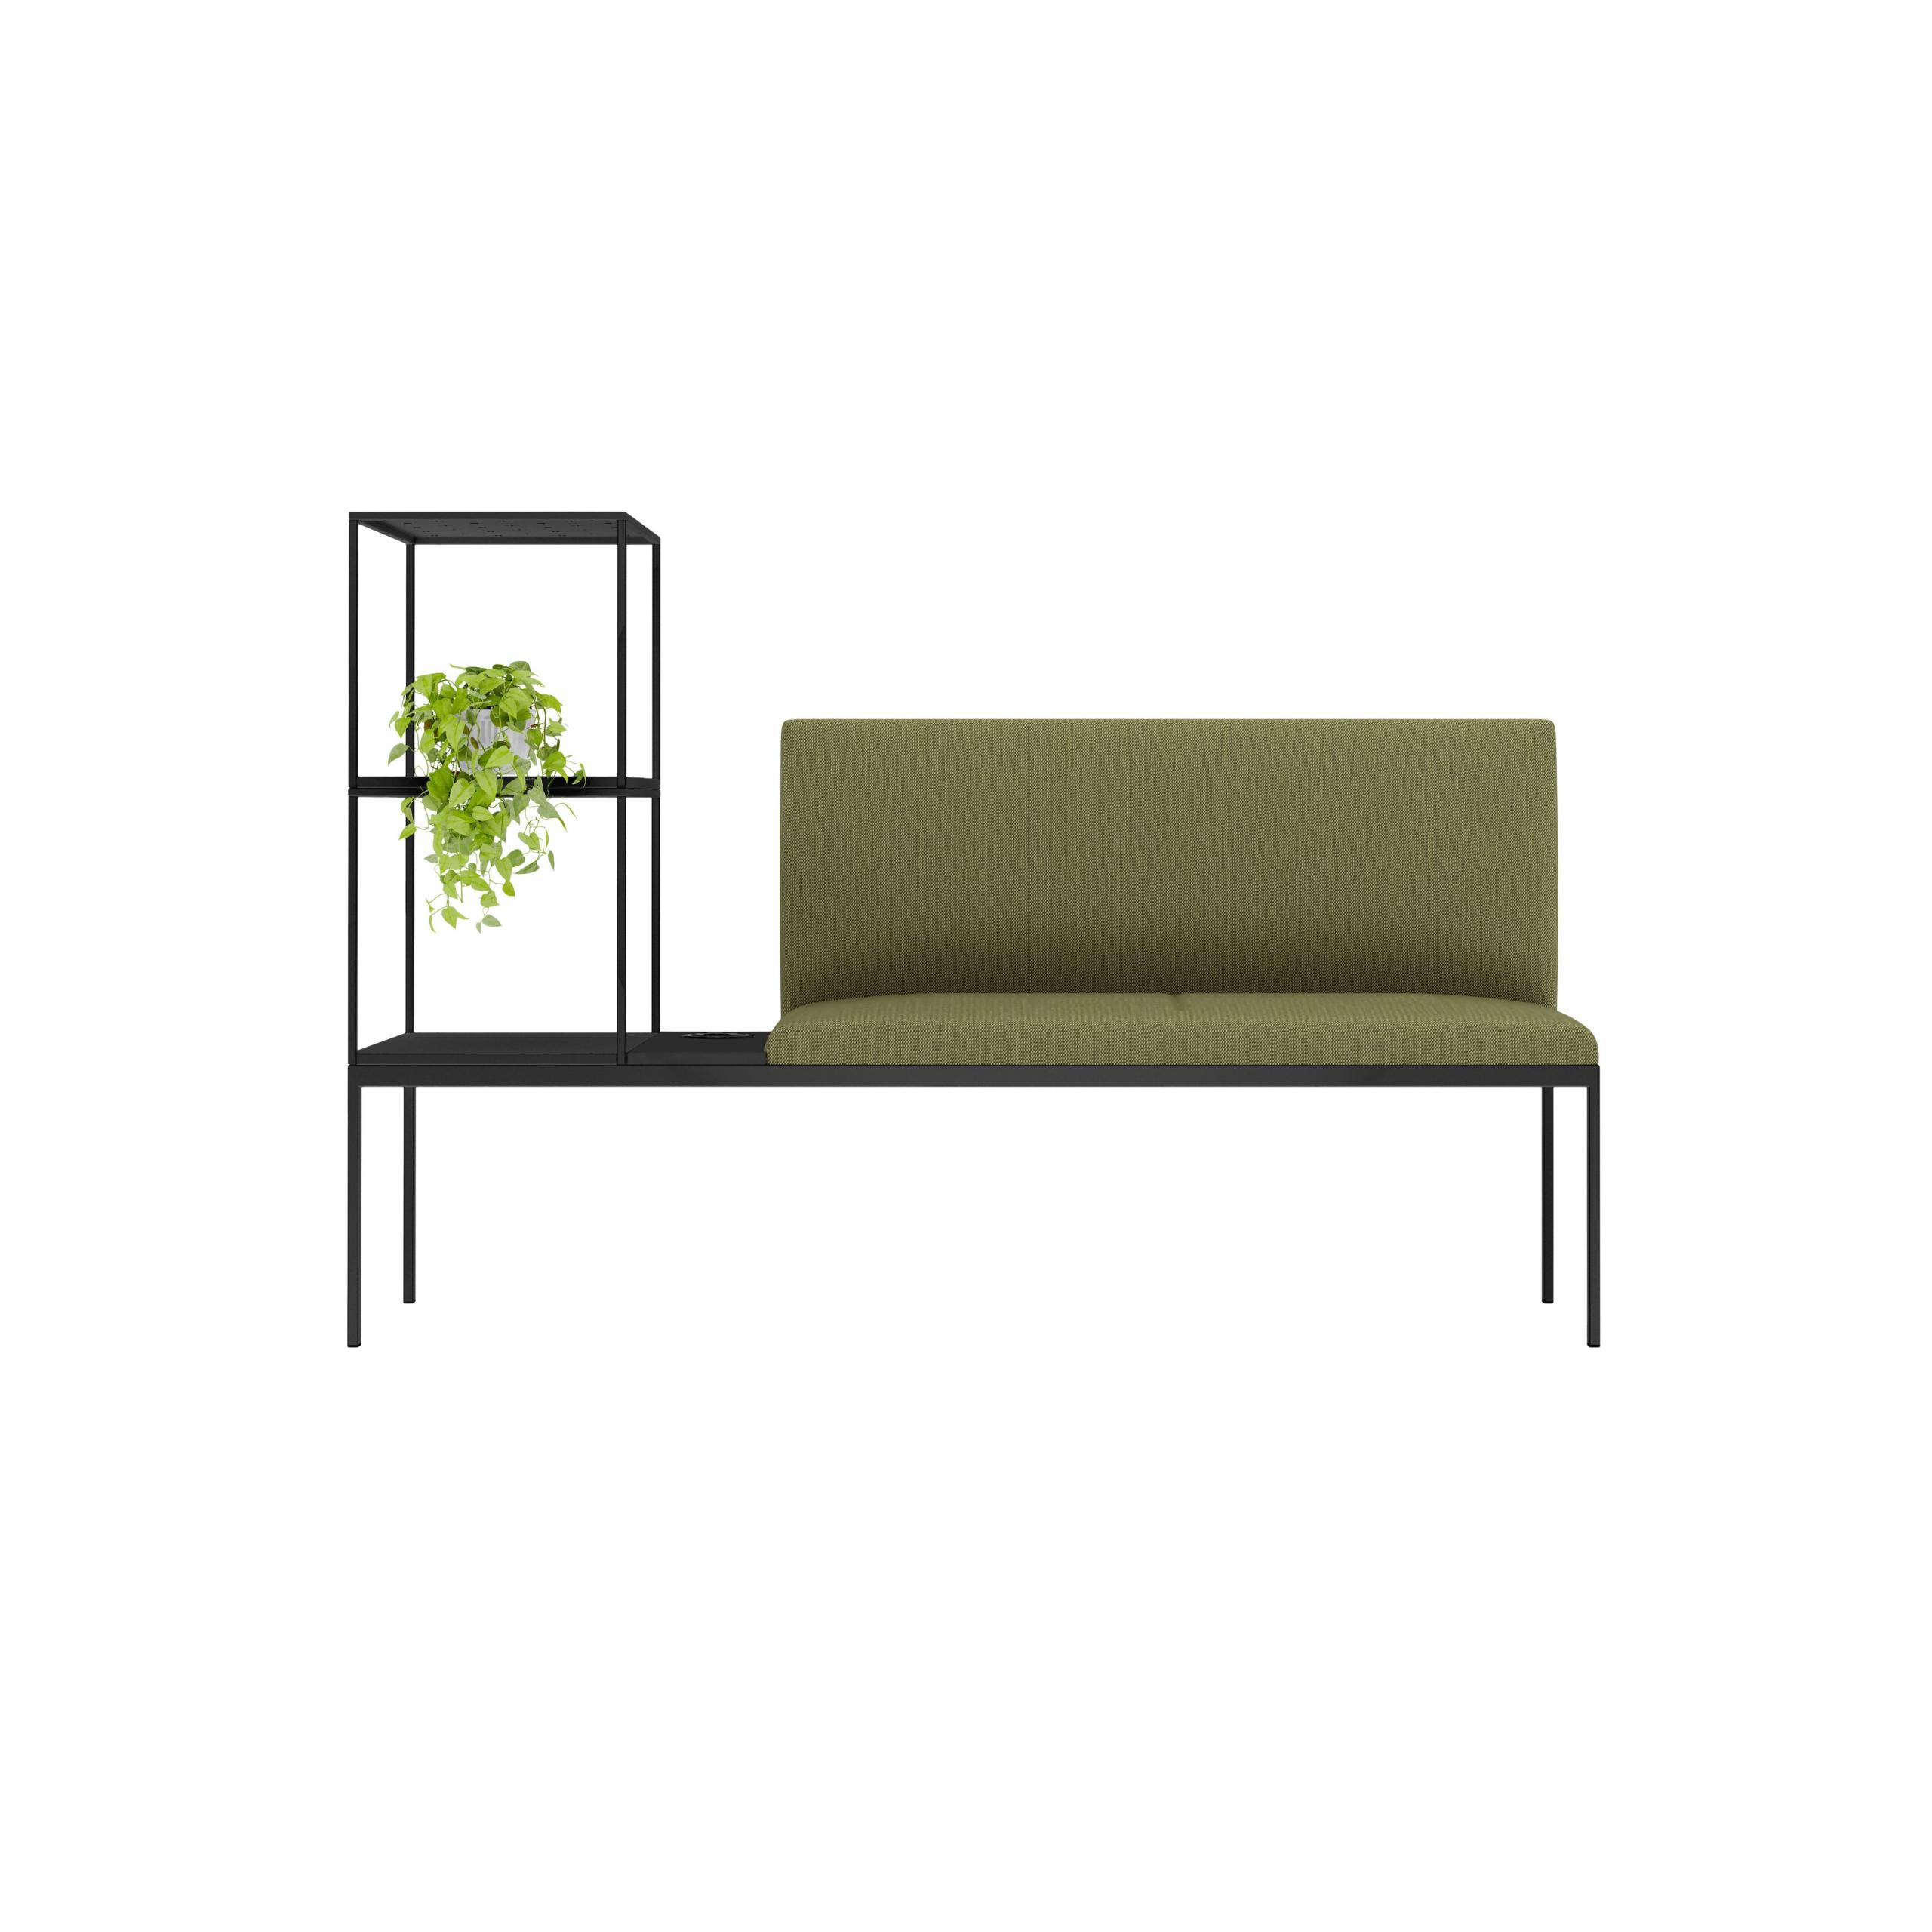 Create Seating Soffa produktbild 2